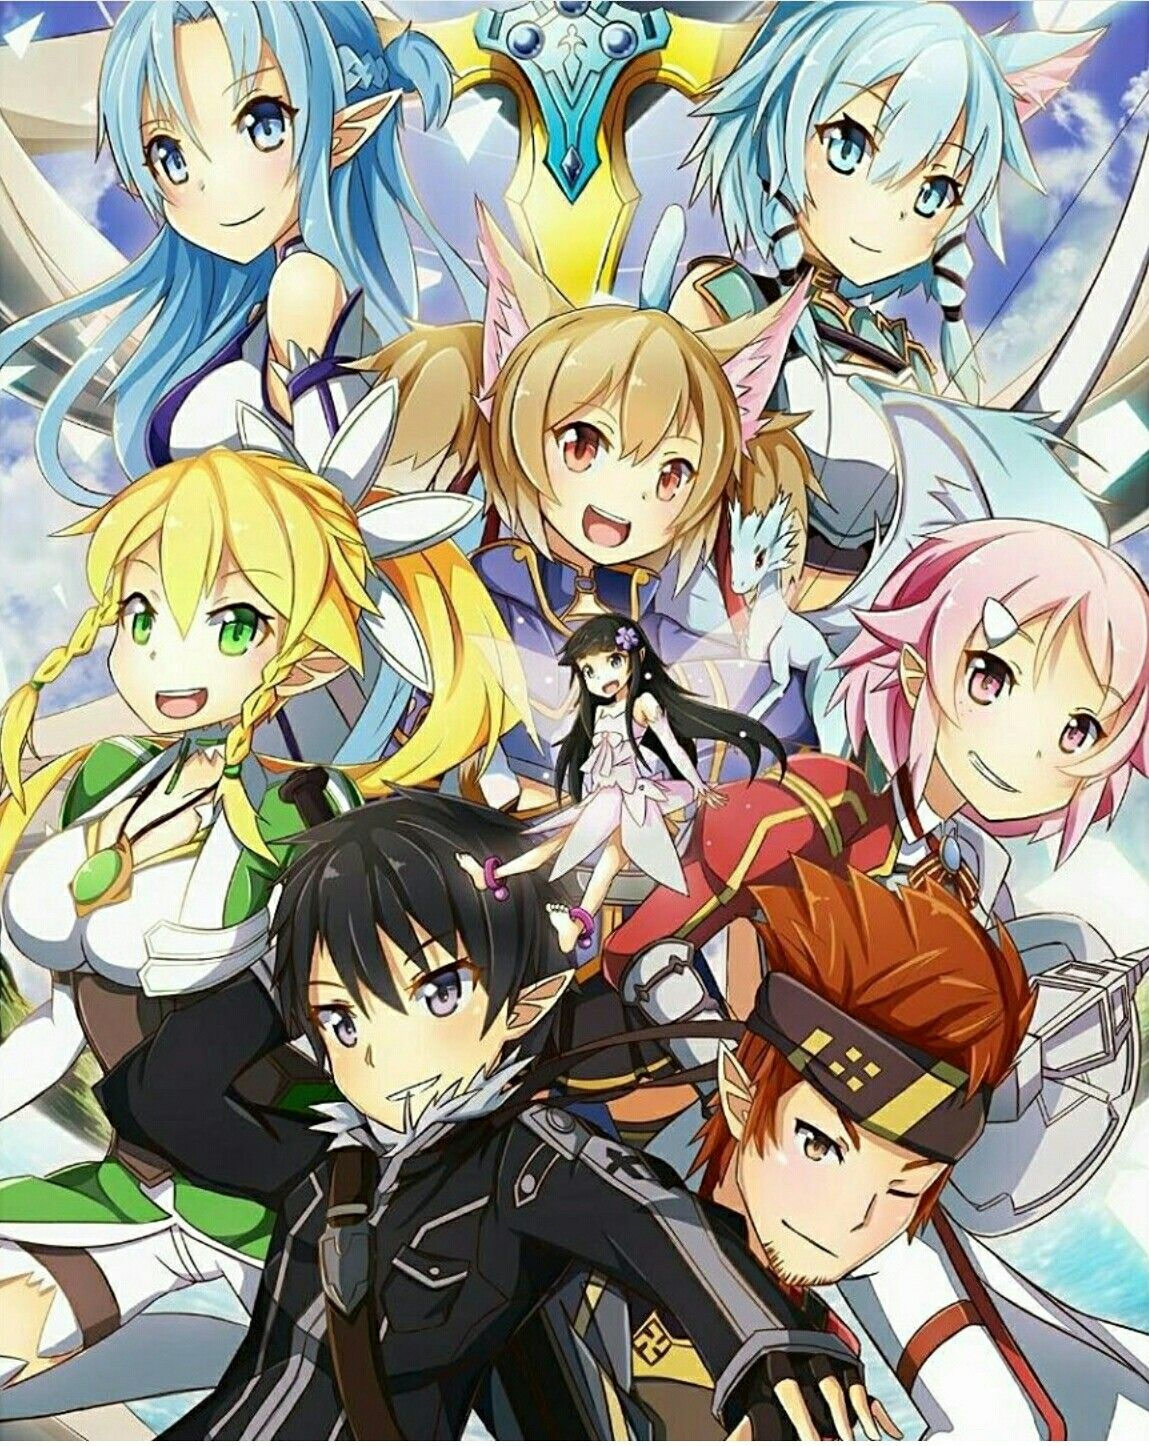 Sword Art Online Characters Lisbeth Silica Asuna Sinon Kirito Klein Yui Leafa Fairies ALO Alfheim